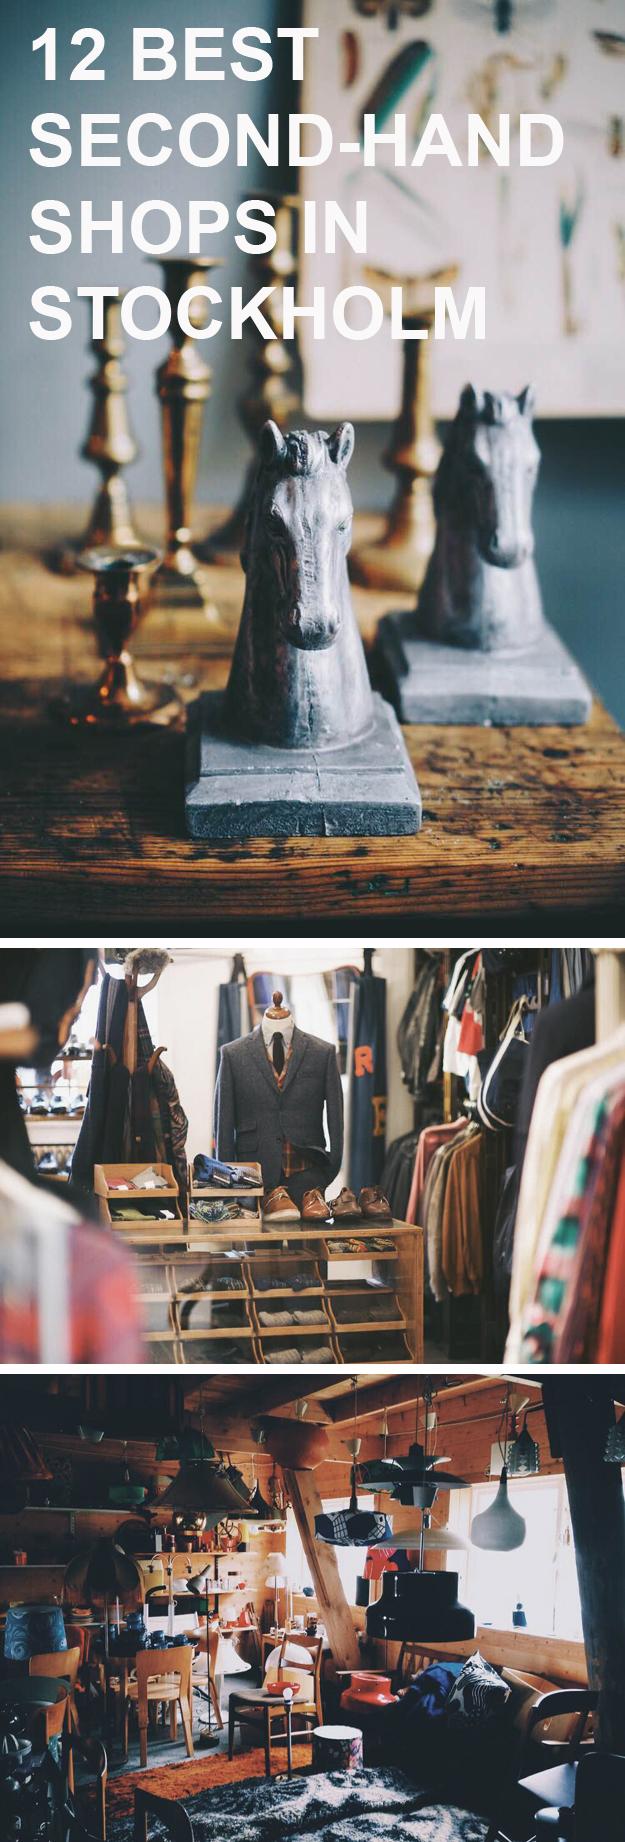 12-best-second-hand-shops-in-stockholm